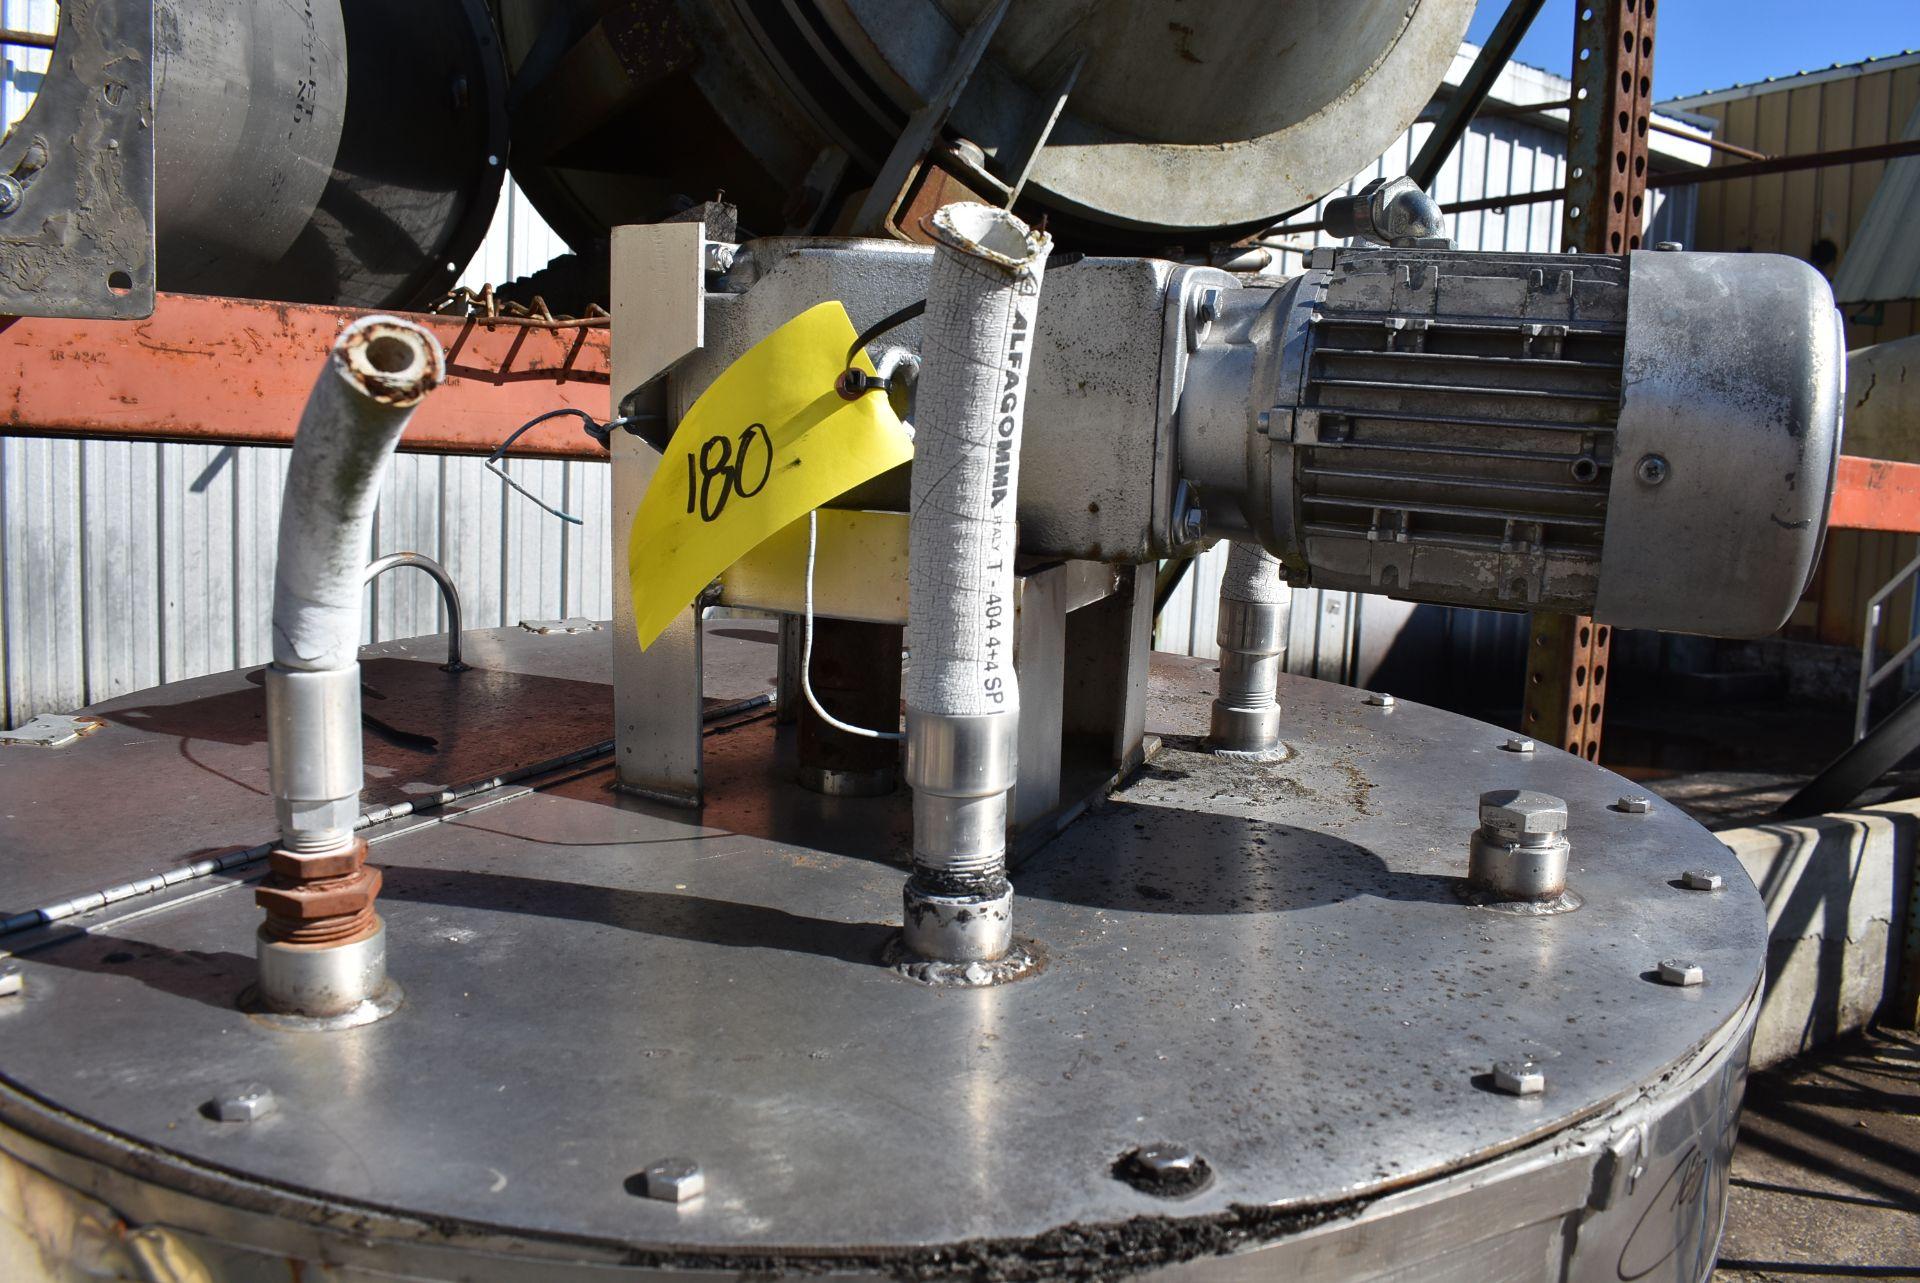 "Stainless Steel Tank, 30"" Diameter x 36"" Top - Flat Bottom, 3 HP Motor & Pump, Includes Mixer - Image 2 of 3"